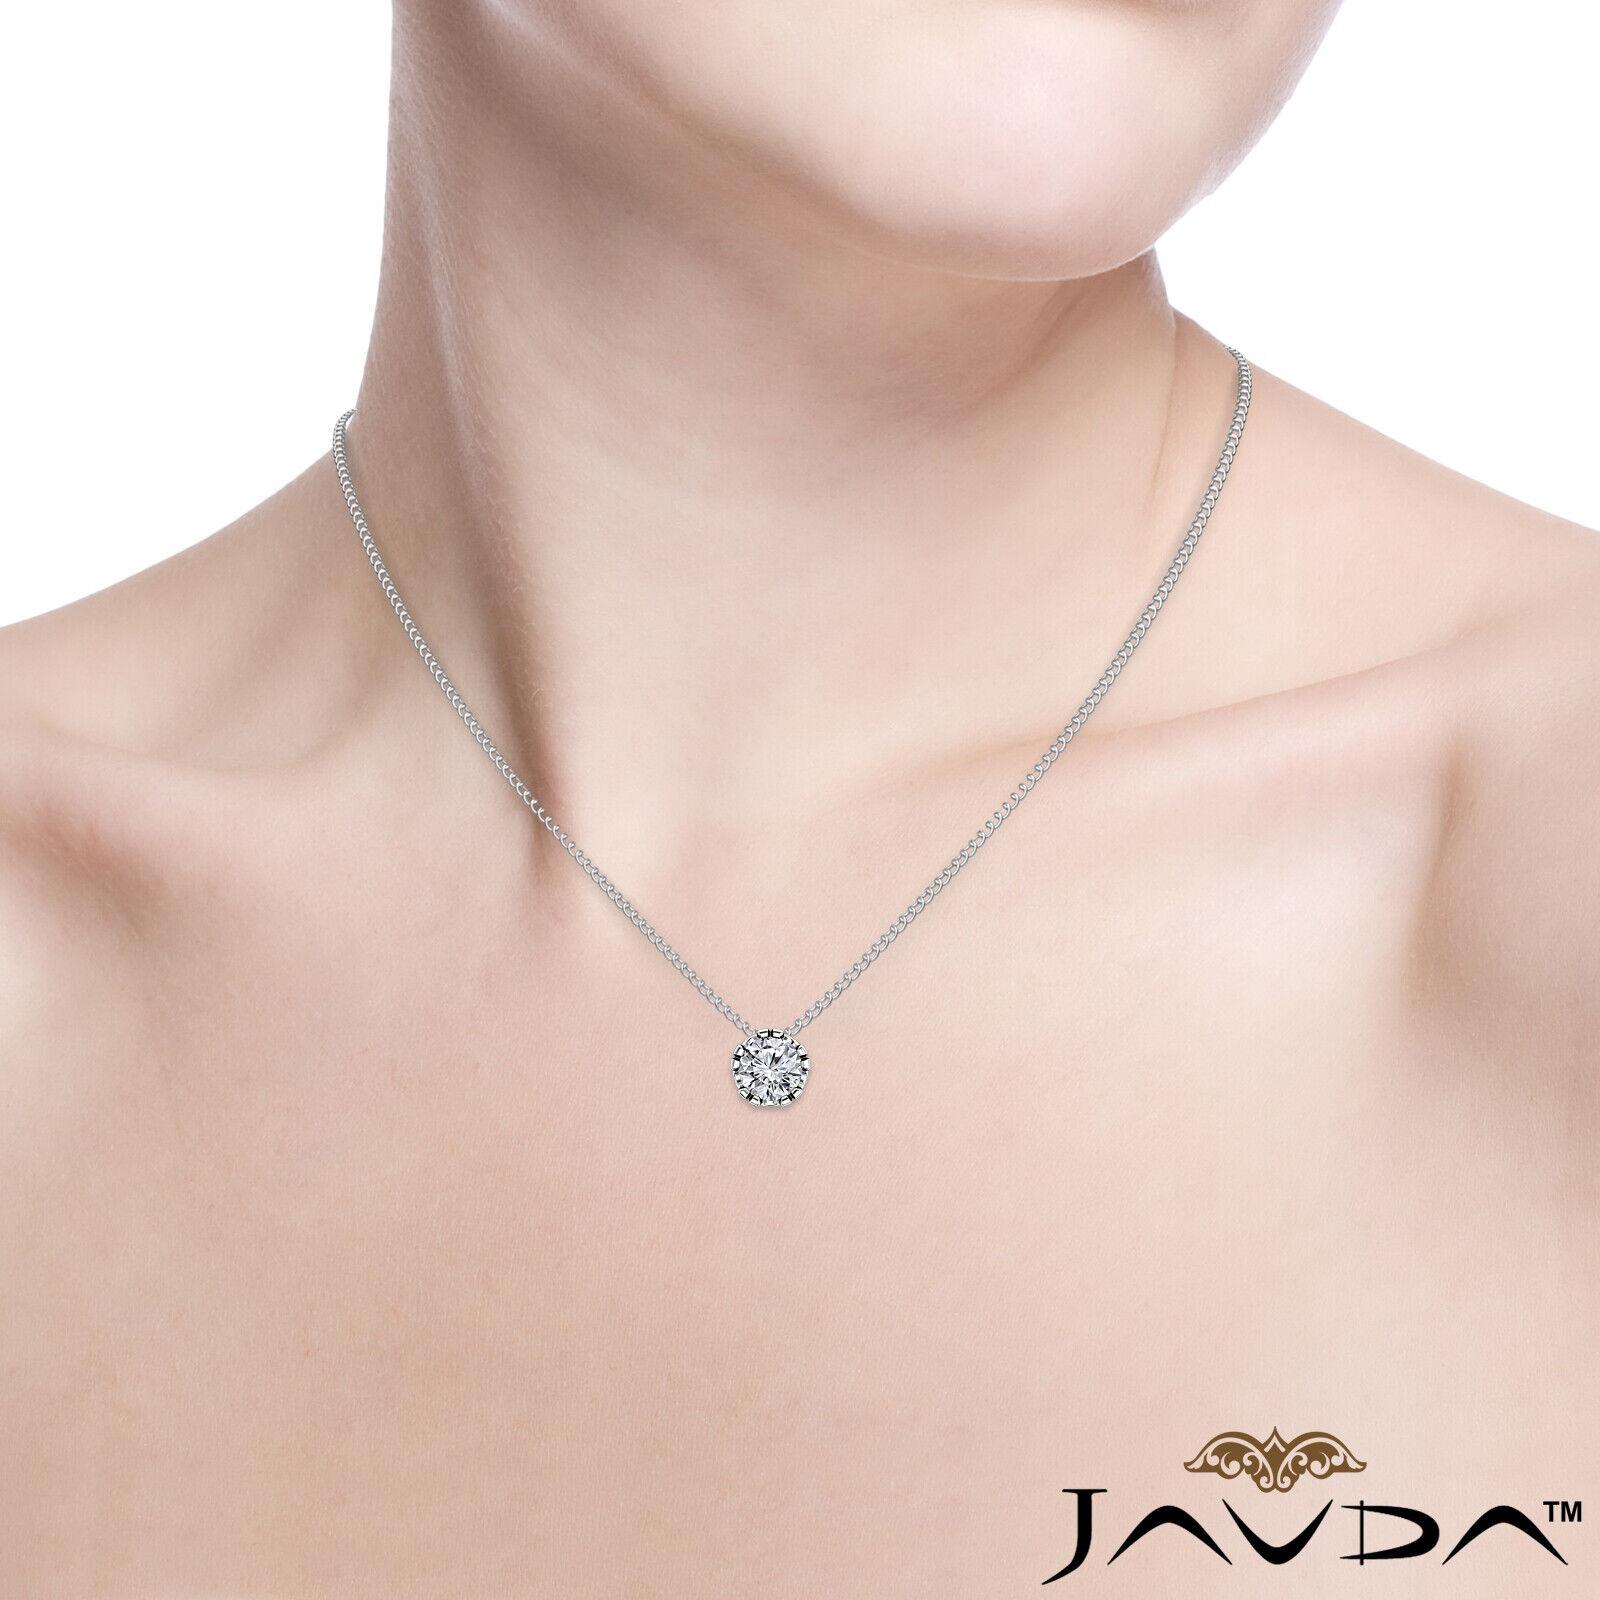 Solitaire Round Shape Diamond Double Prong Pendant 18 Inch Rolo Chain 0.26 ctw. 6